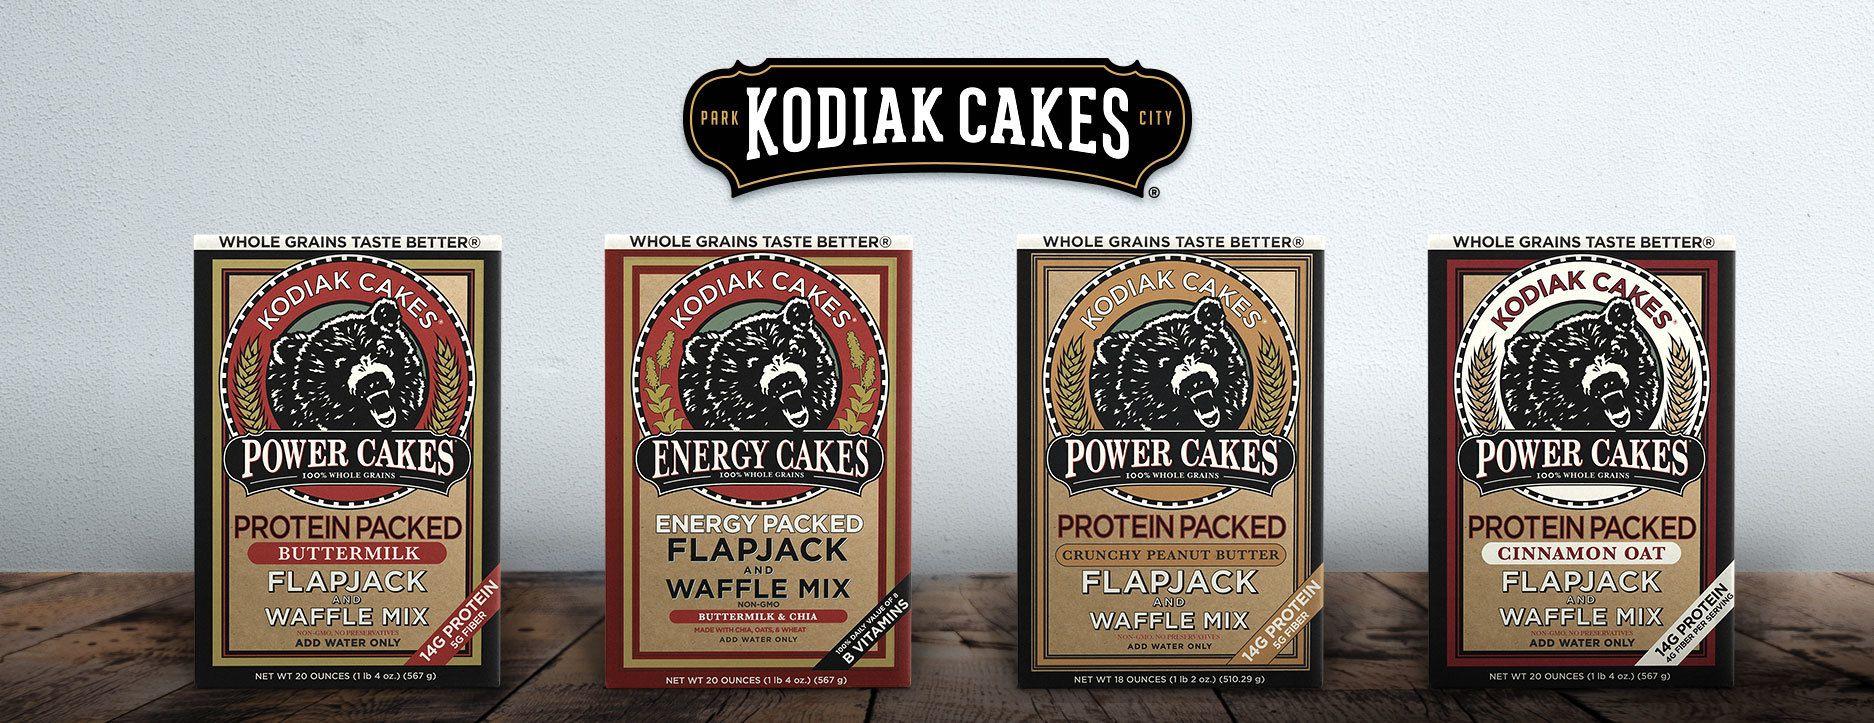 Kodiak cakes protein packed buttermilk flapjack waffle